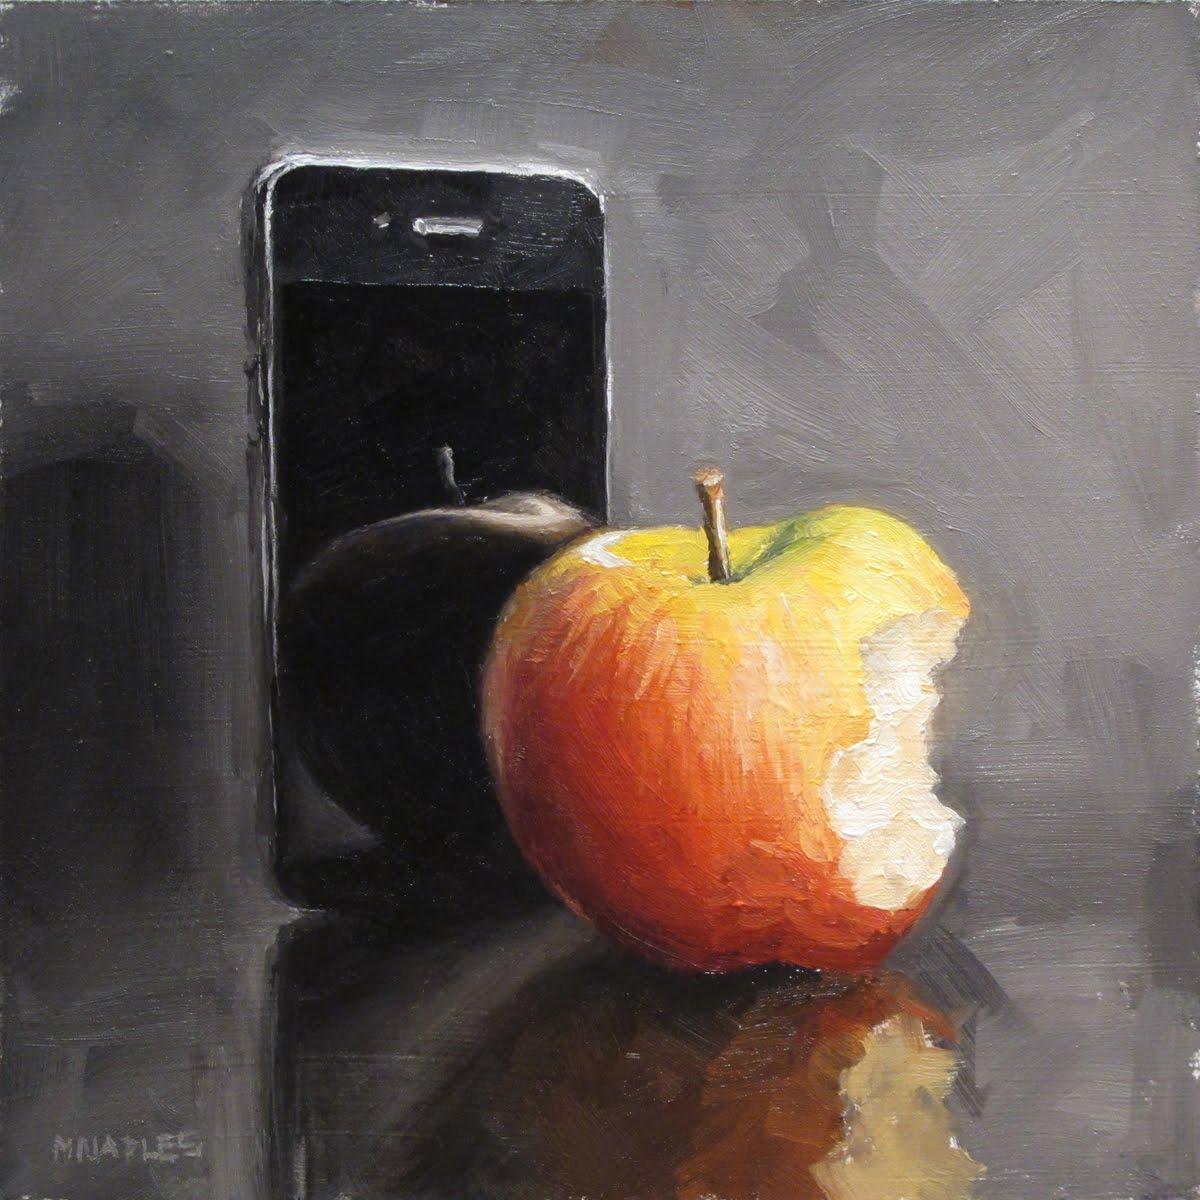 """Apple with Honeycrisp"" original fine art by Michael Naples"